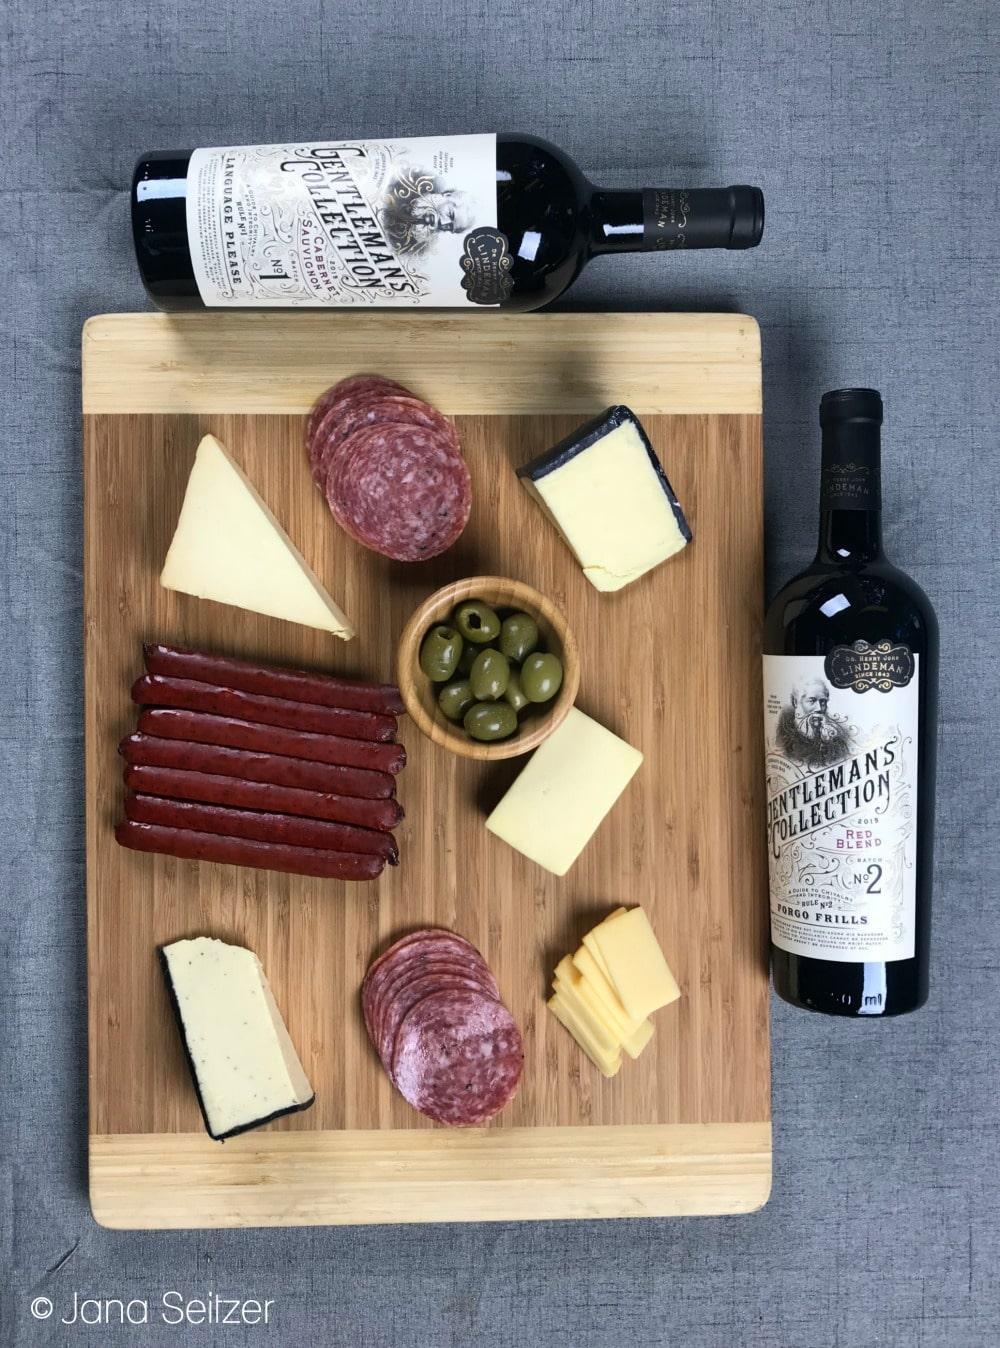 Gentlemans Collection Wine -